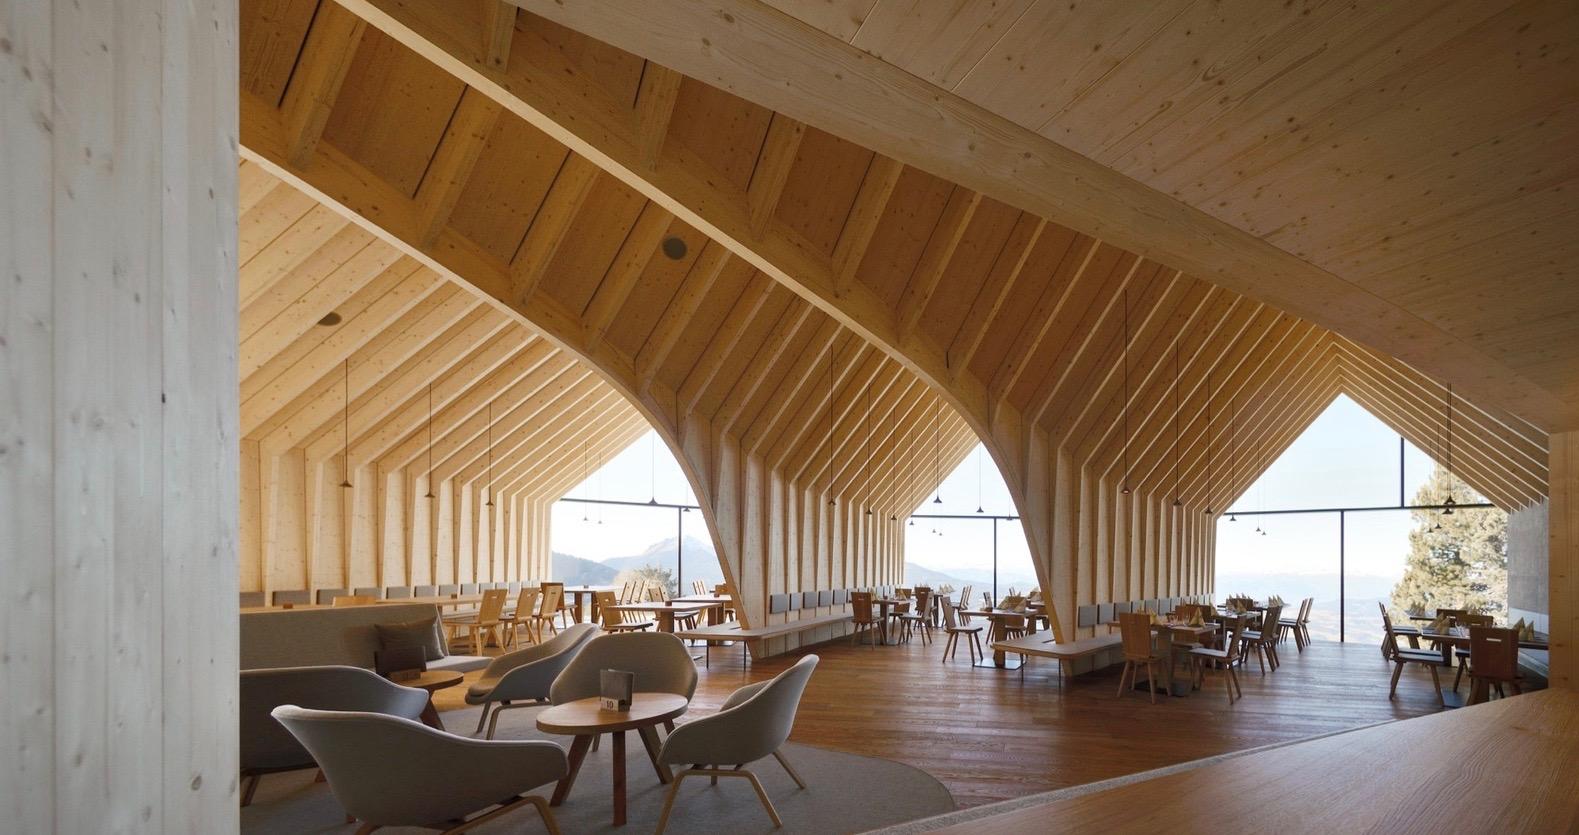 Peter_Pichler_Architecture_Oberholz_10 2.jpg